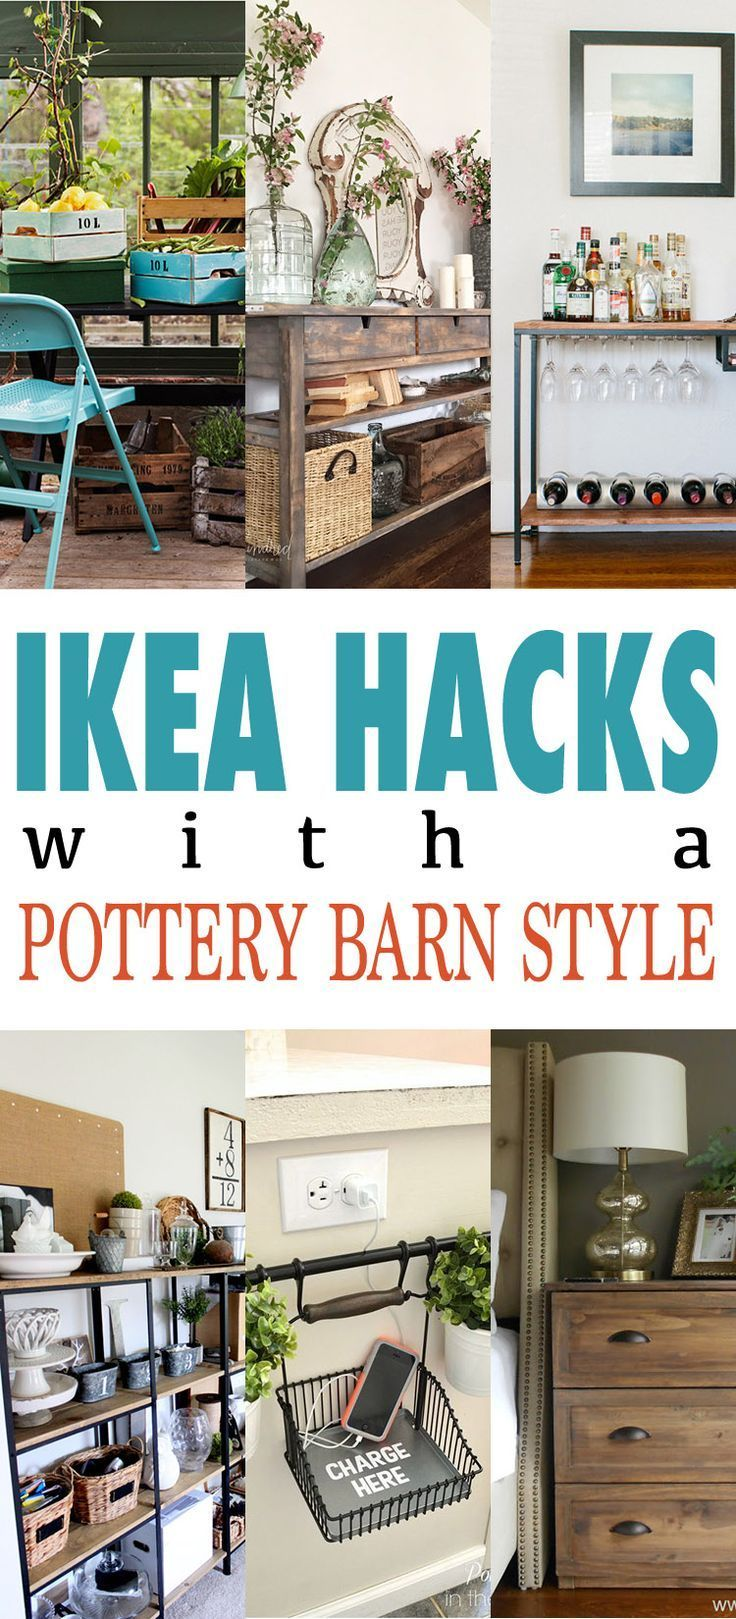 Ikea Hacks with a Pottery Barn Style